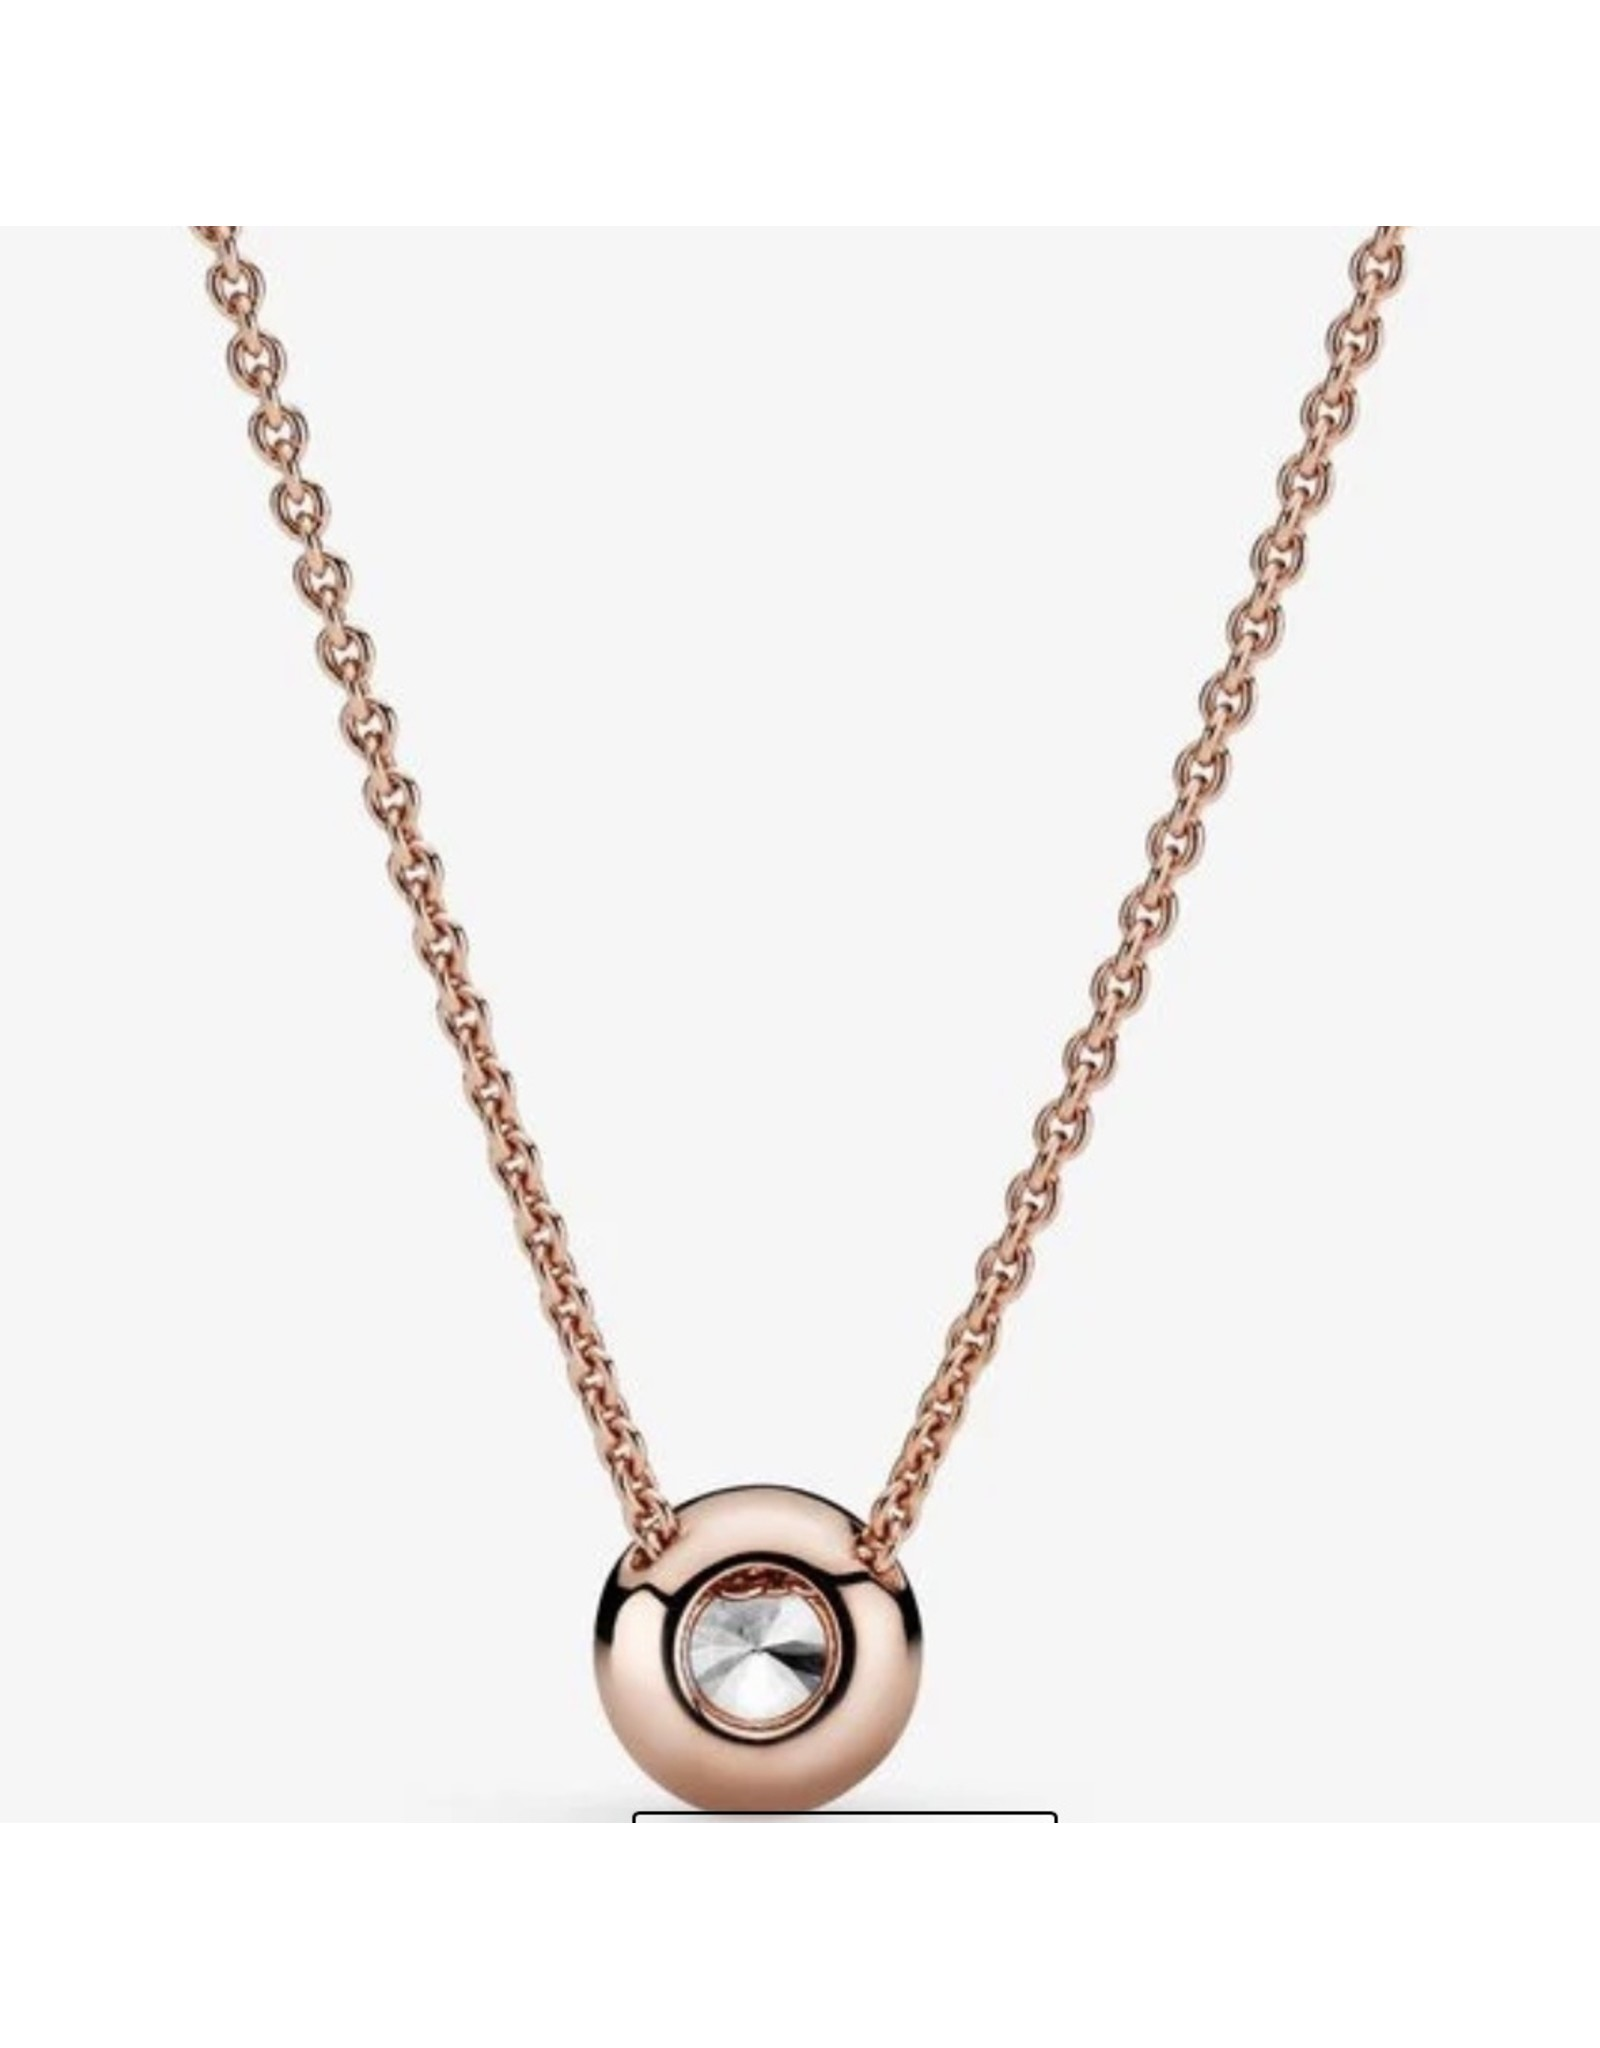 Pandora Pandora Necklace,386240CZ-45, Round CZ, Rose Gold